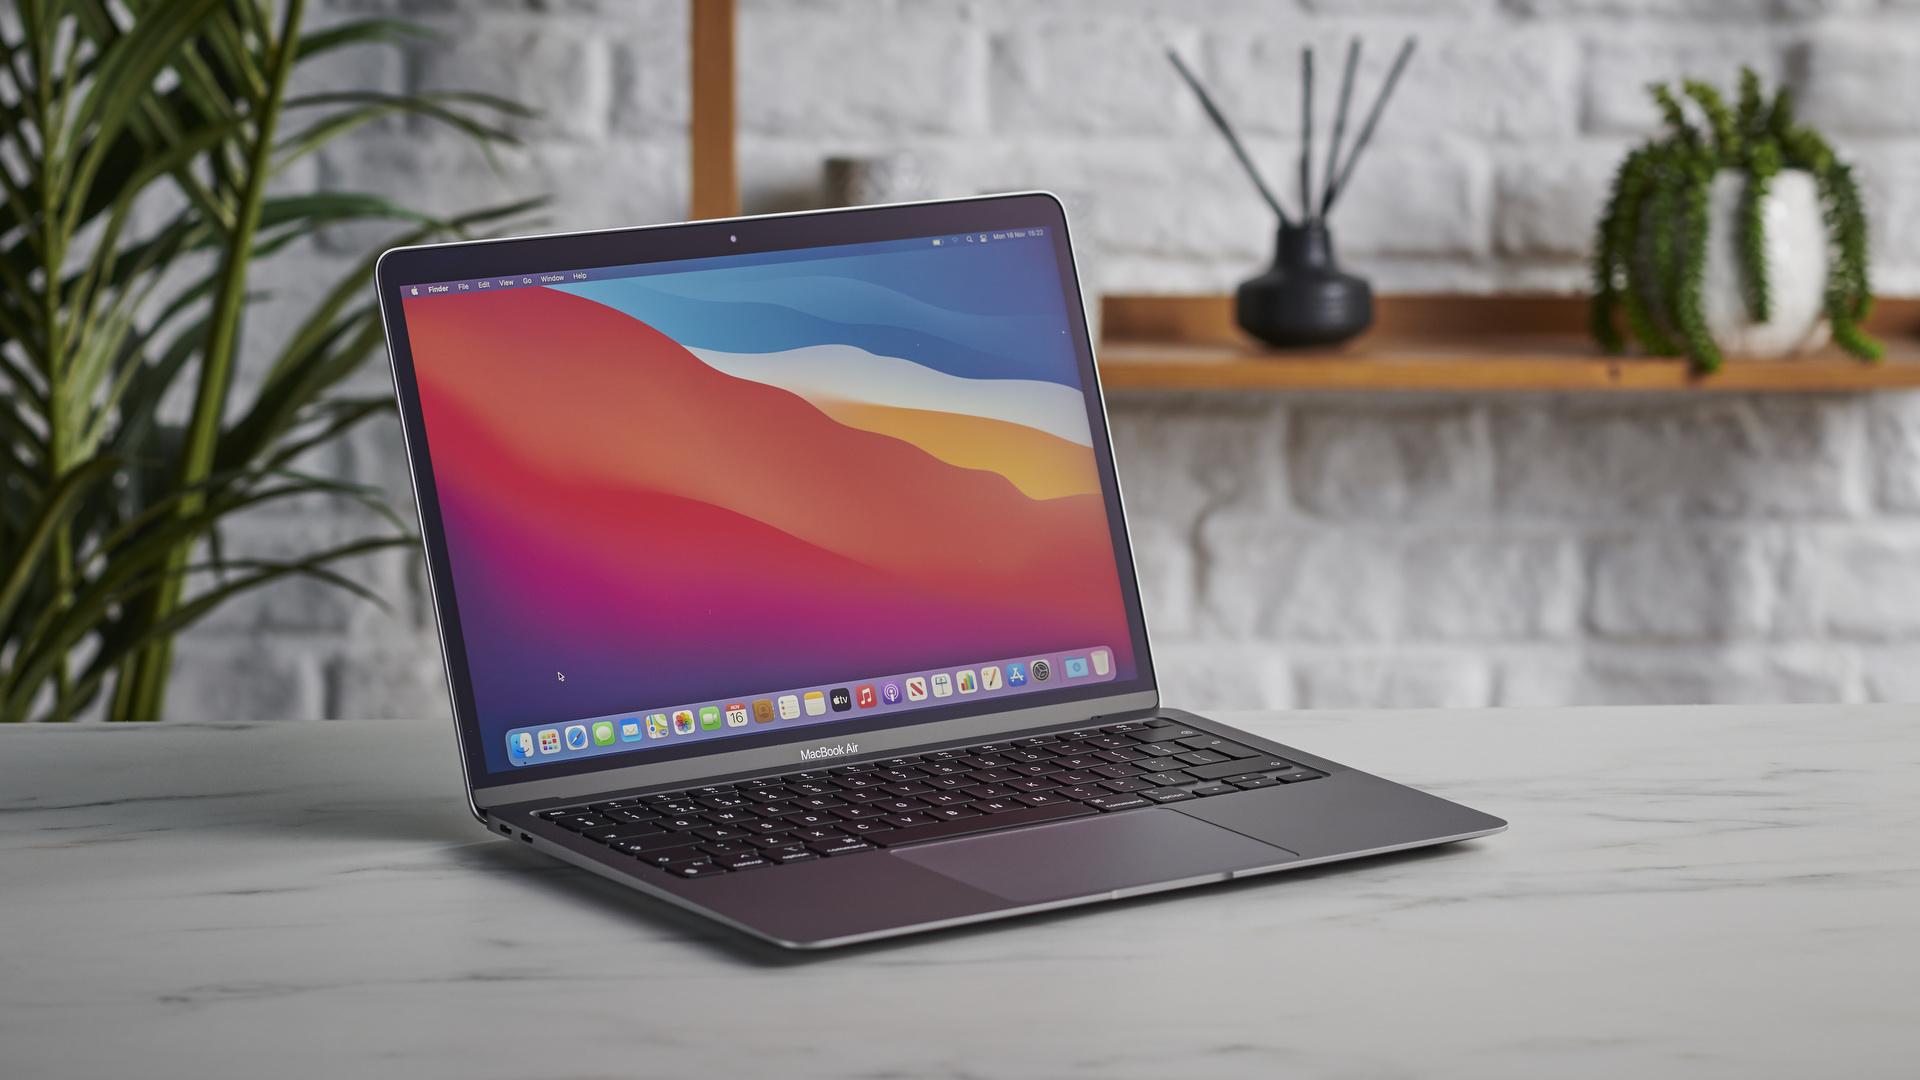 BootCamp列表官方|苹果电脑装Windows驱动对照表下载|Macbook型号年份保修查询